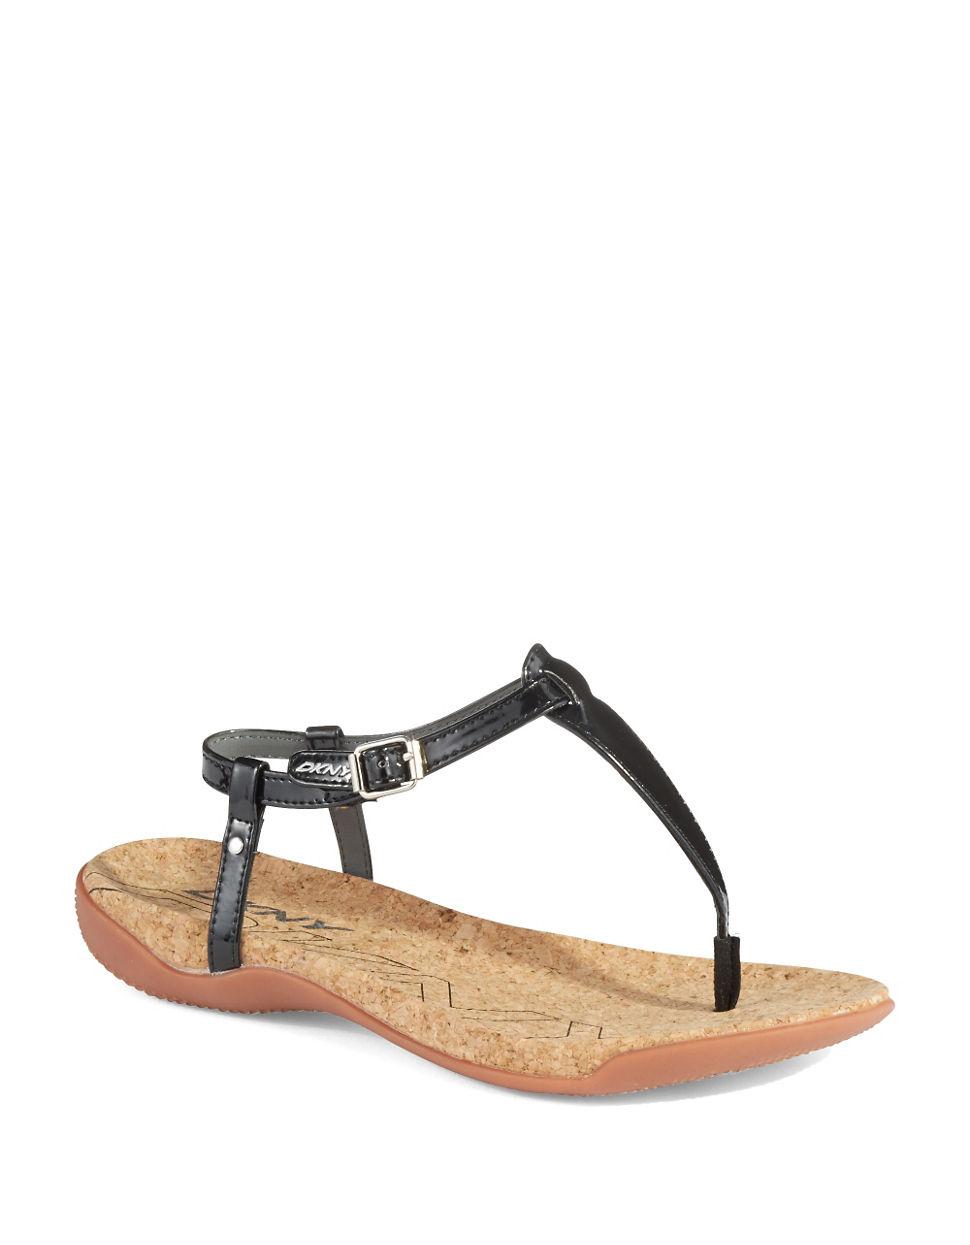 cd827428e3a4 Lyst - Dkny Sabrina Thong Sandals in Black